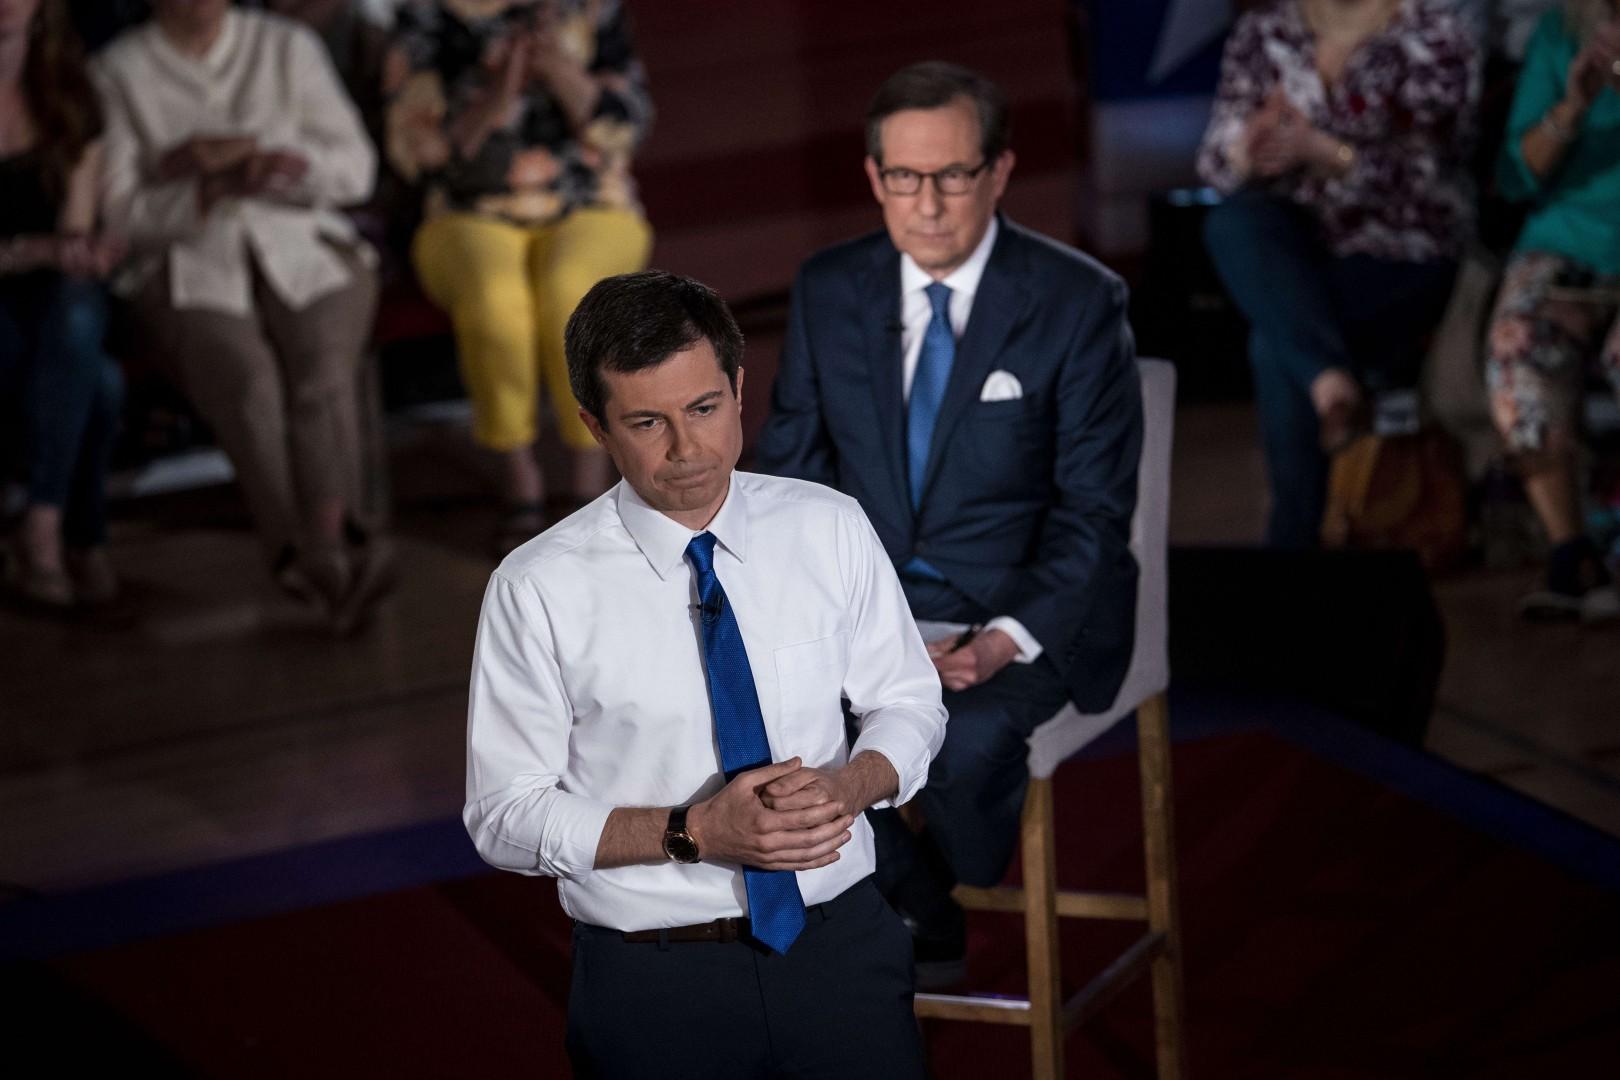 Democrat Pete Buttigieg finds friends on Fox as he calls out